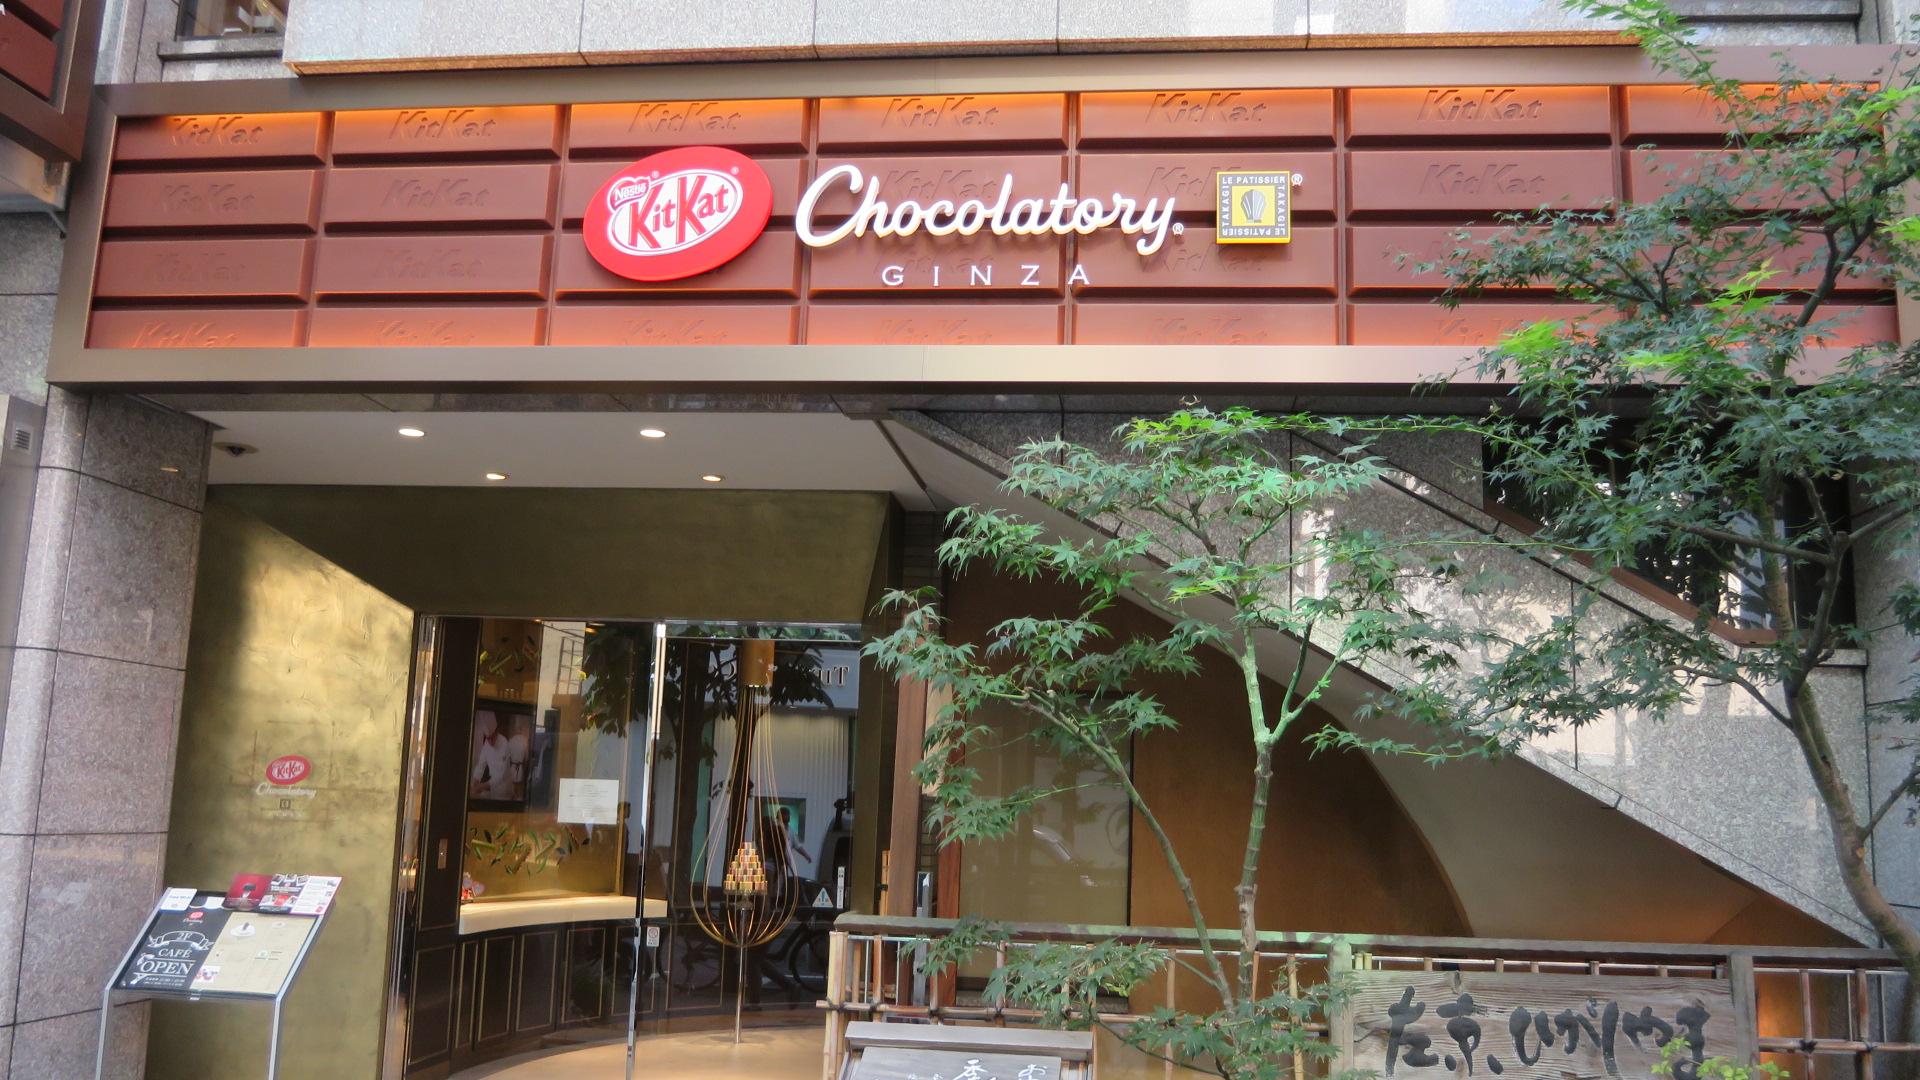 KitKat Chocolatory Ginza